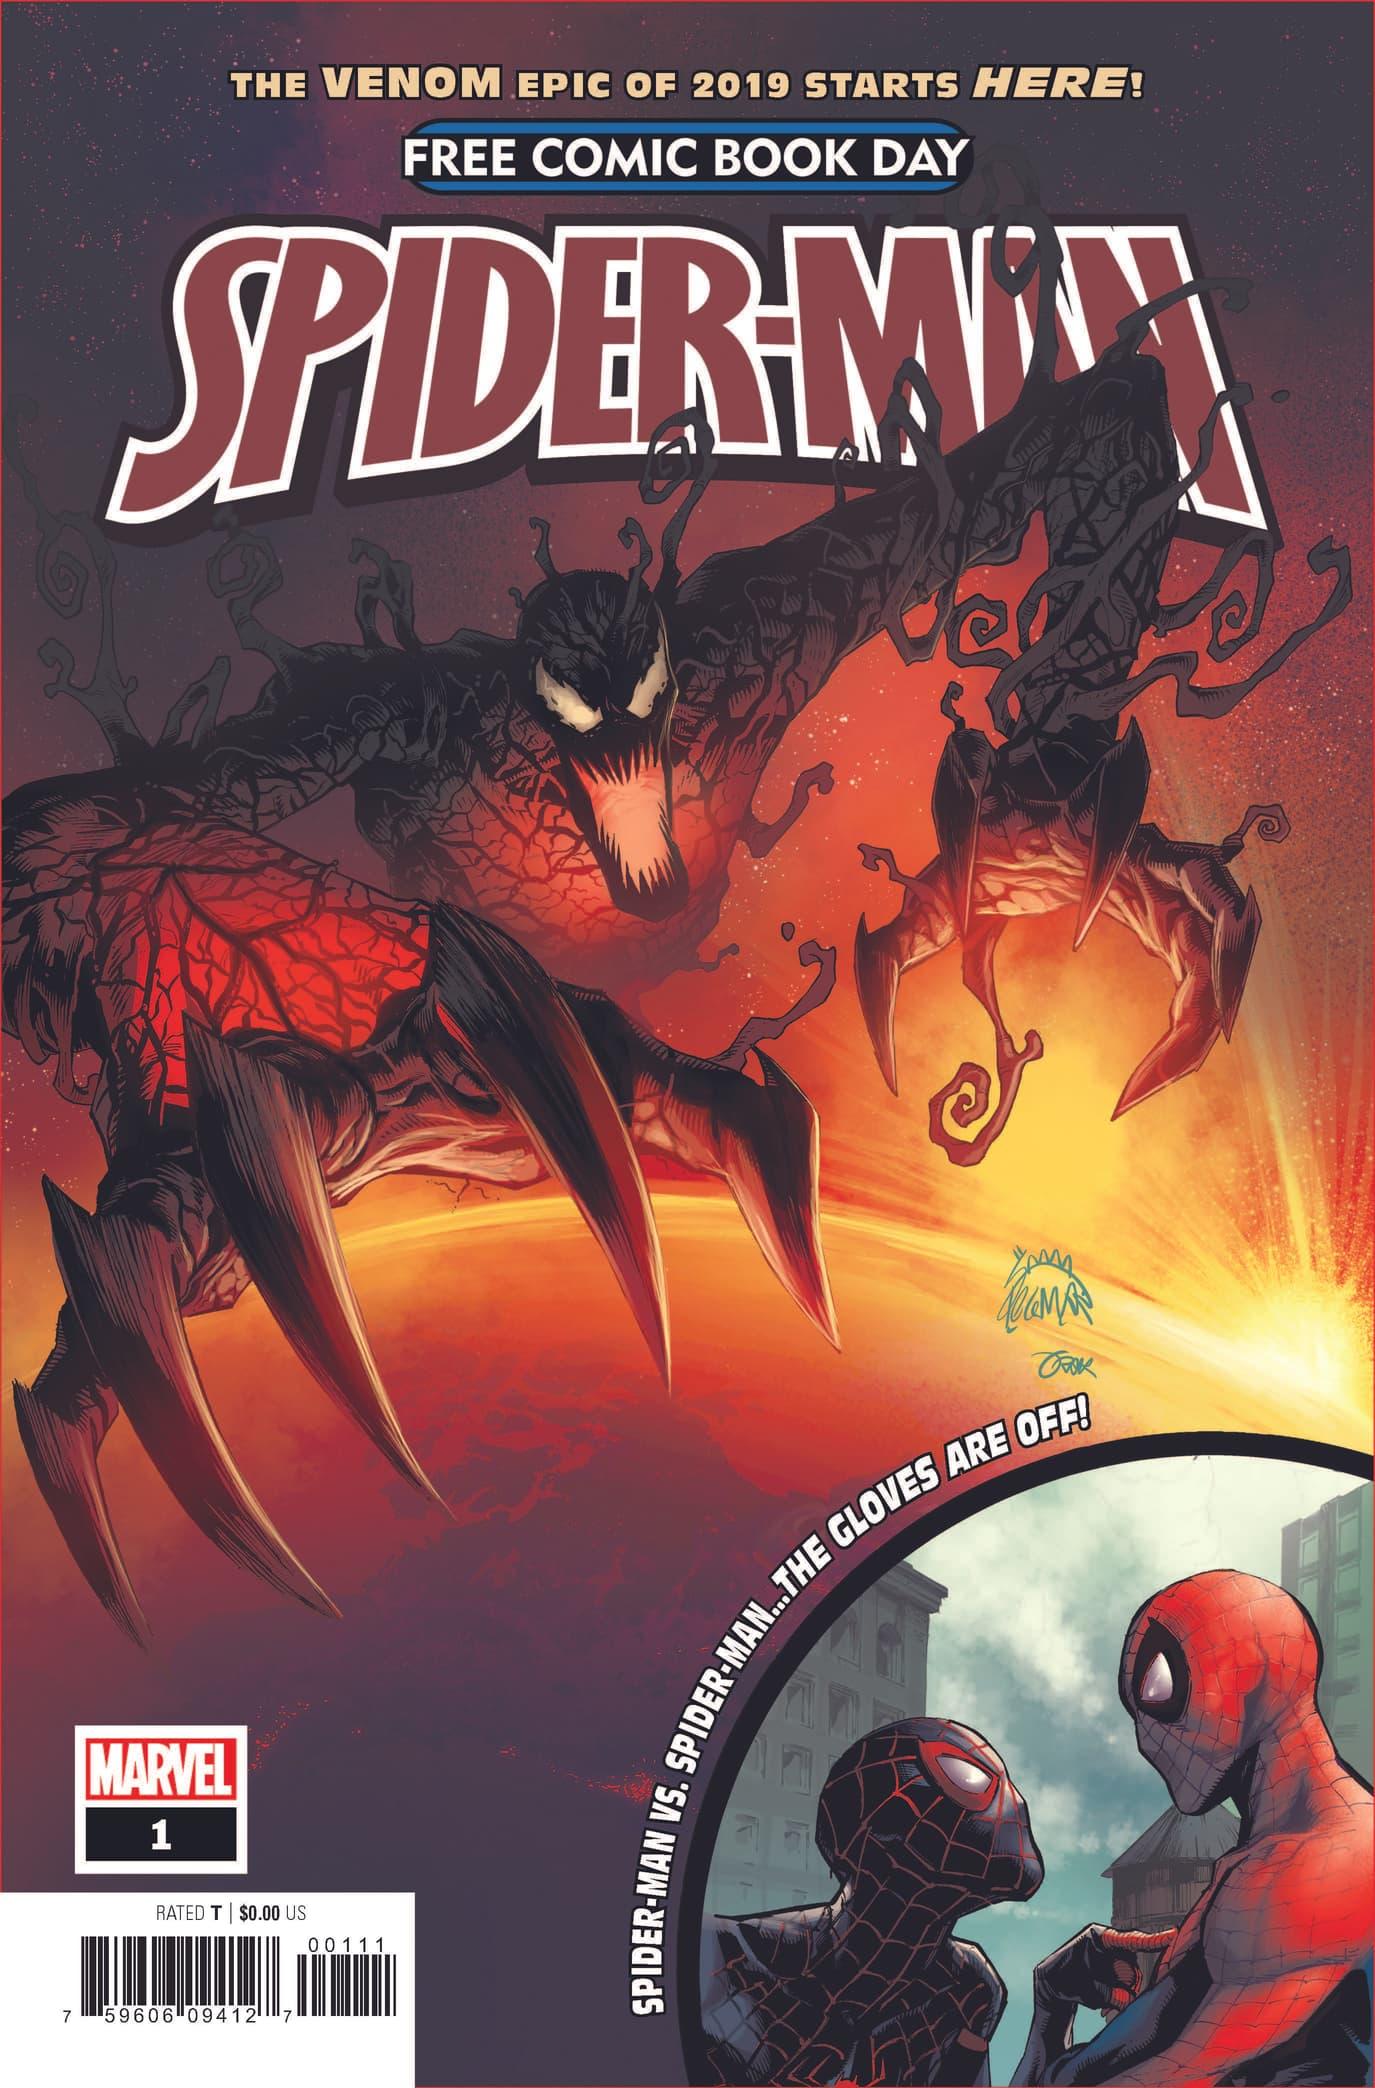 FCBD Spider-Man #1